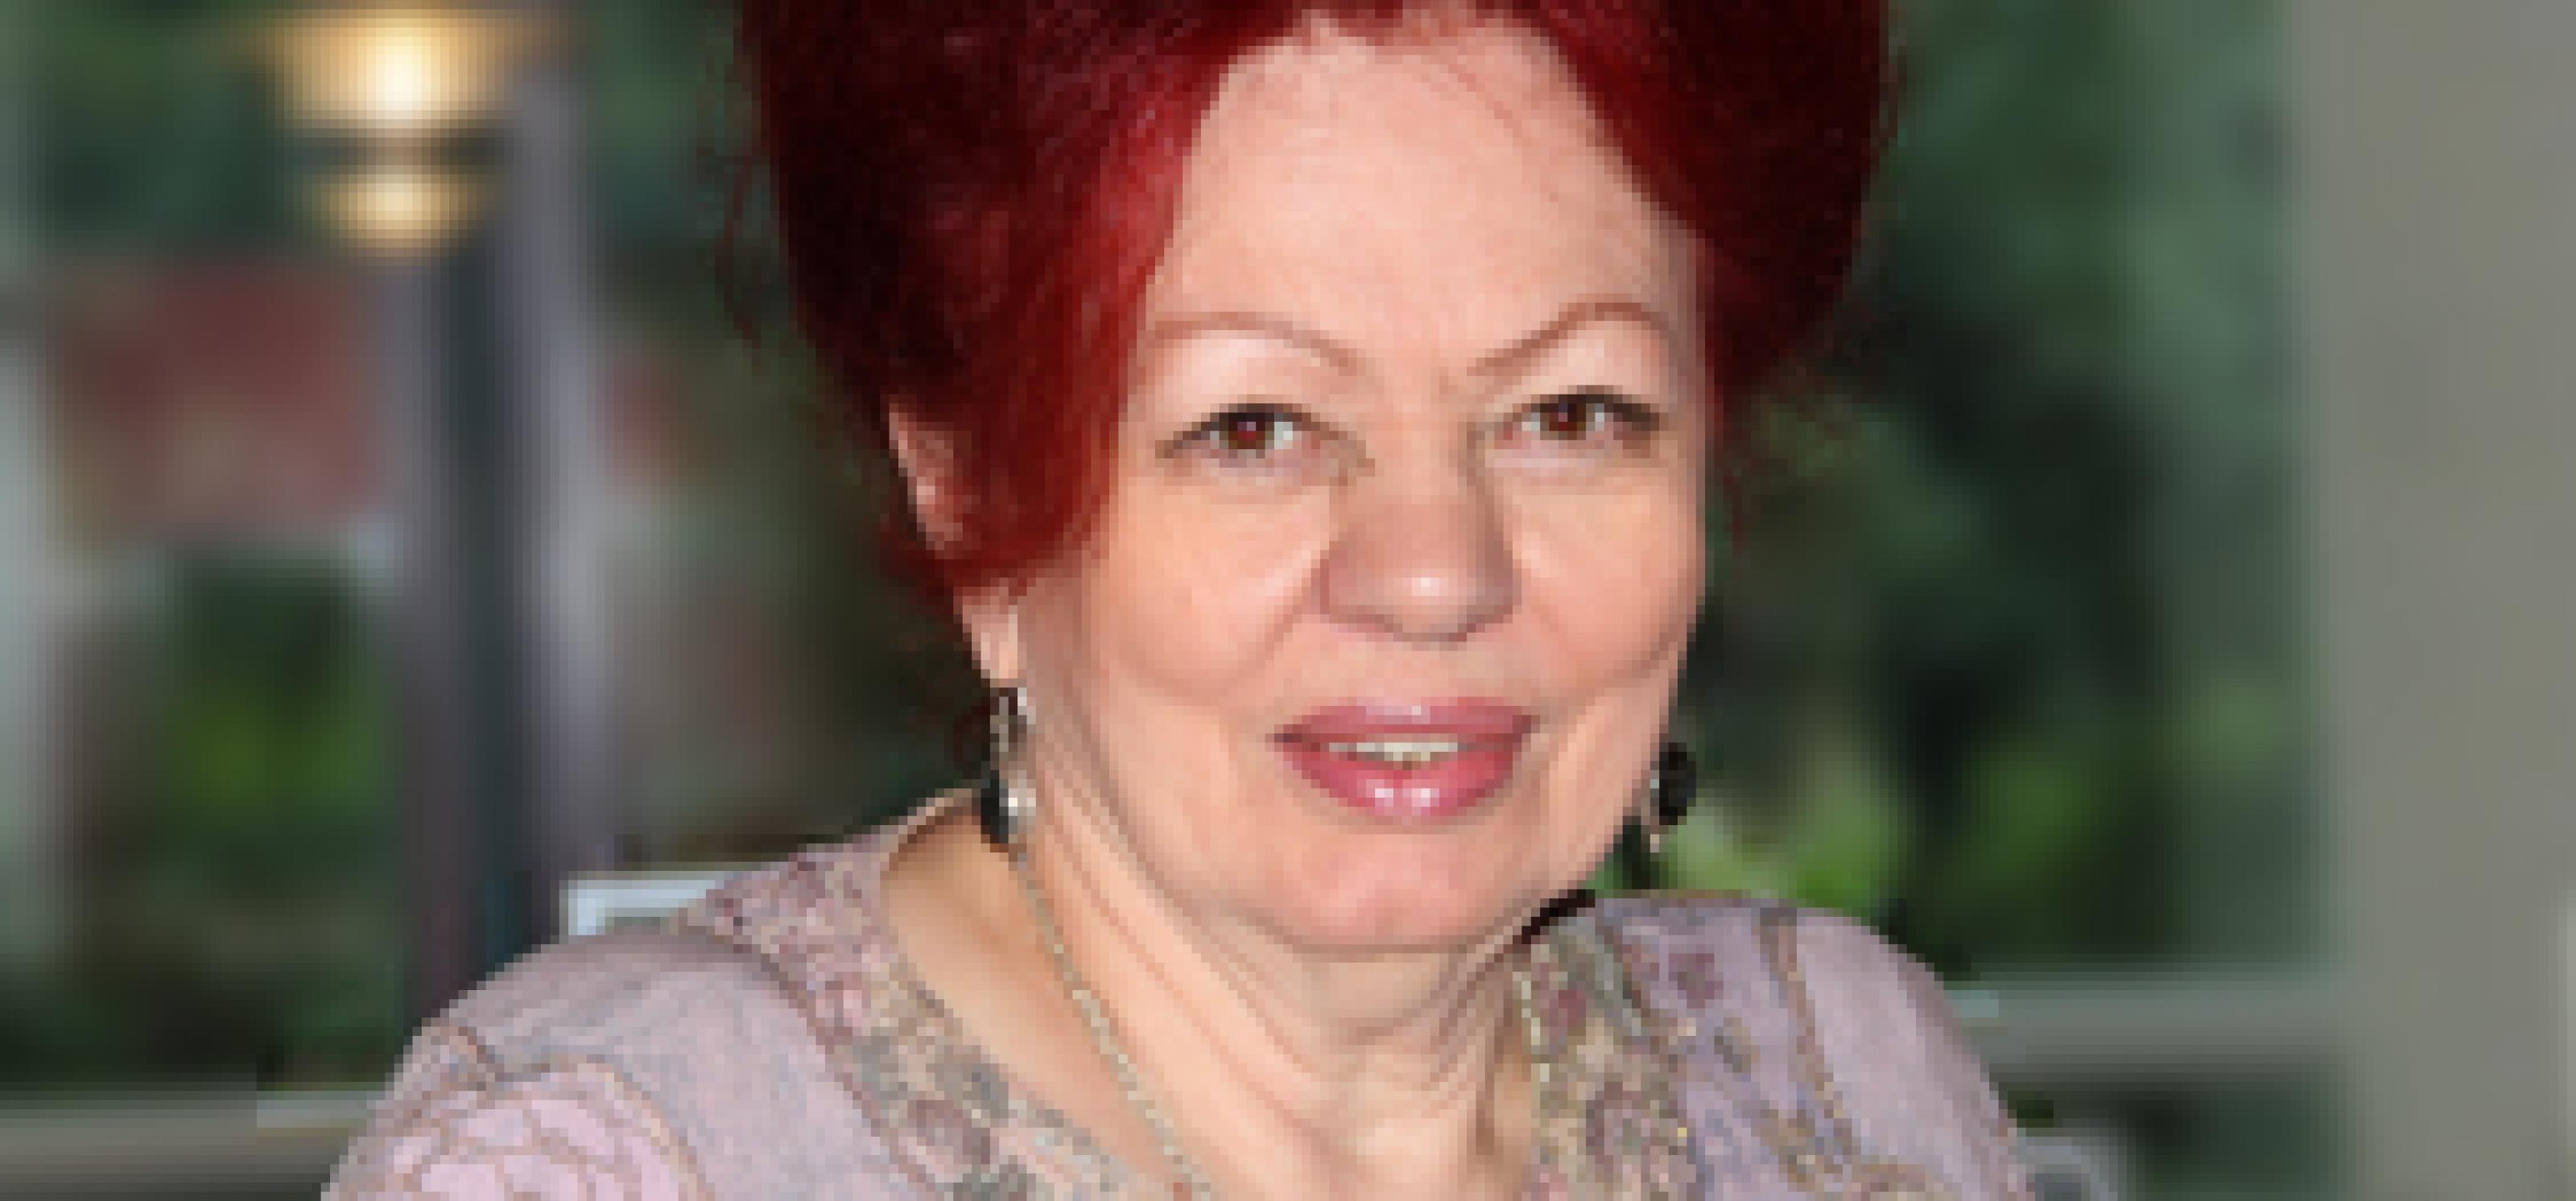 Laura Halding-Hoppenheit